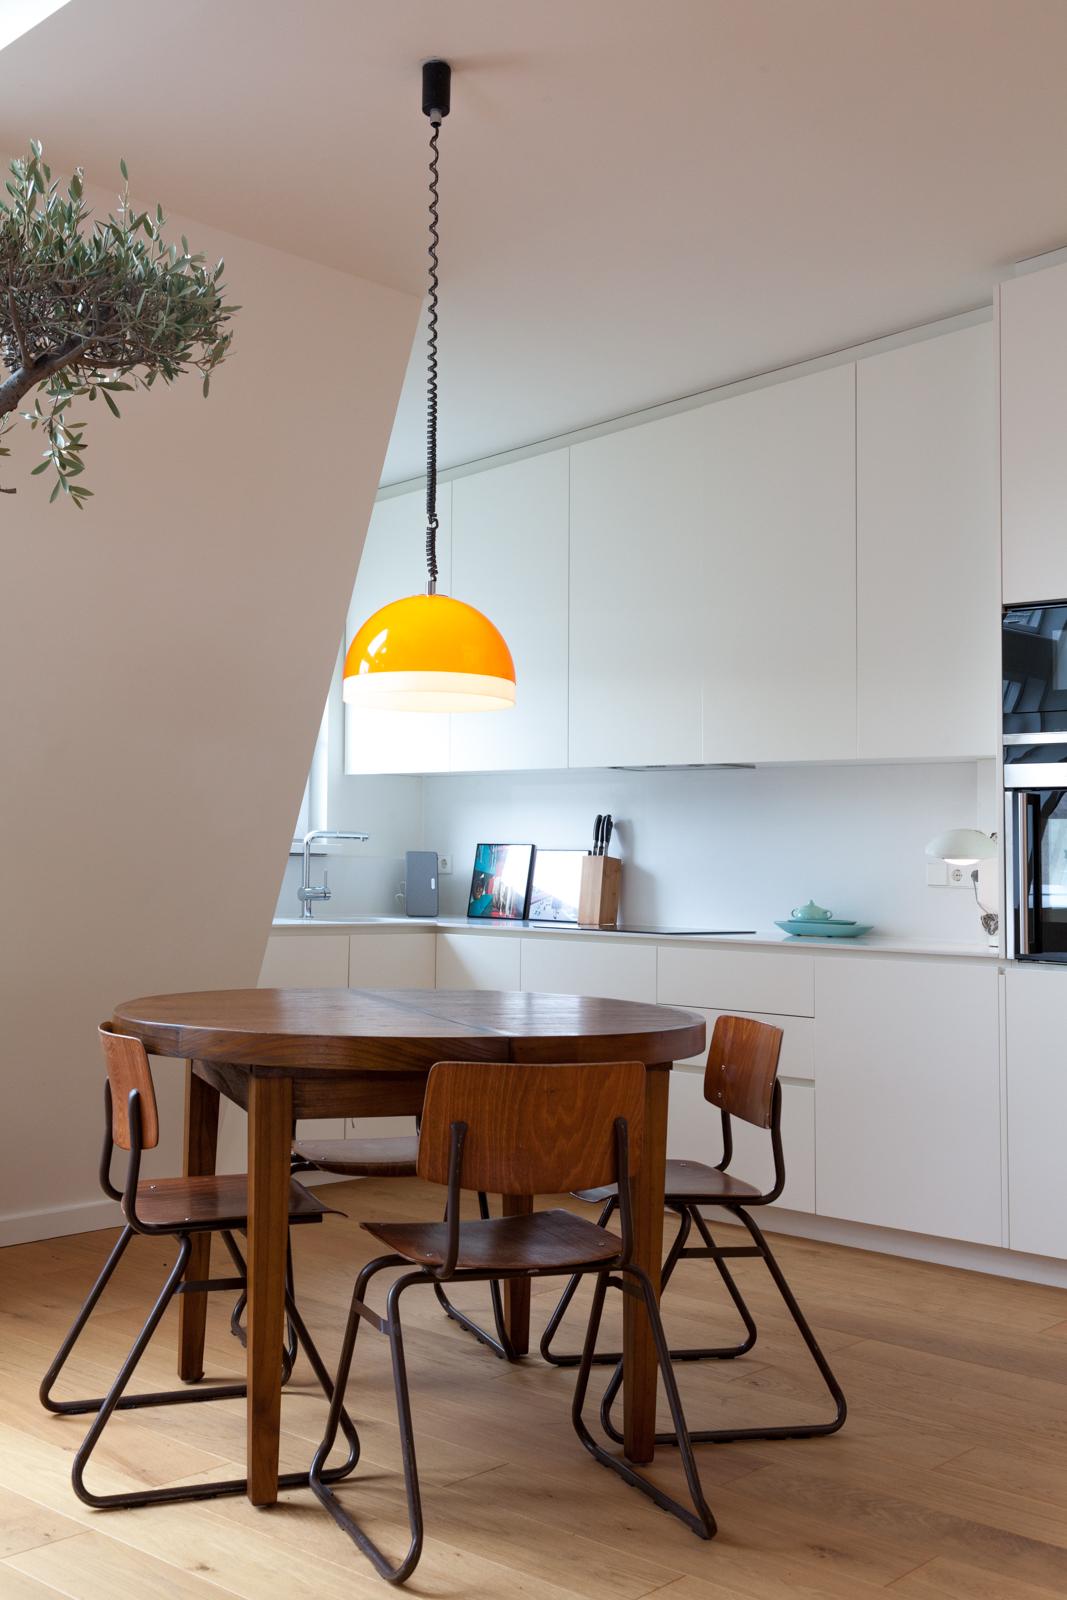 Kitchen Interior by Luca Lancini